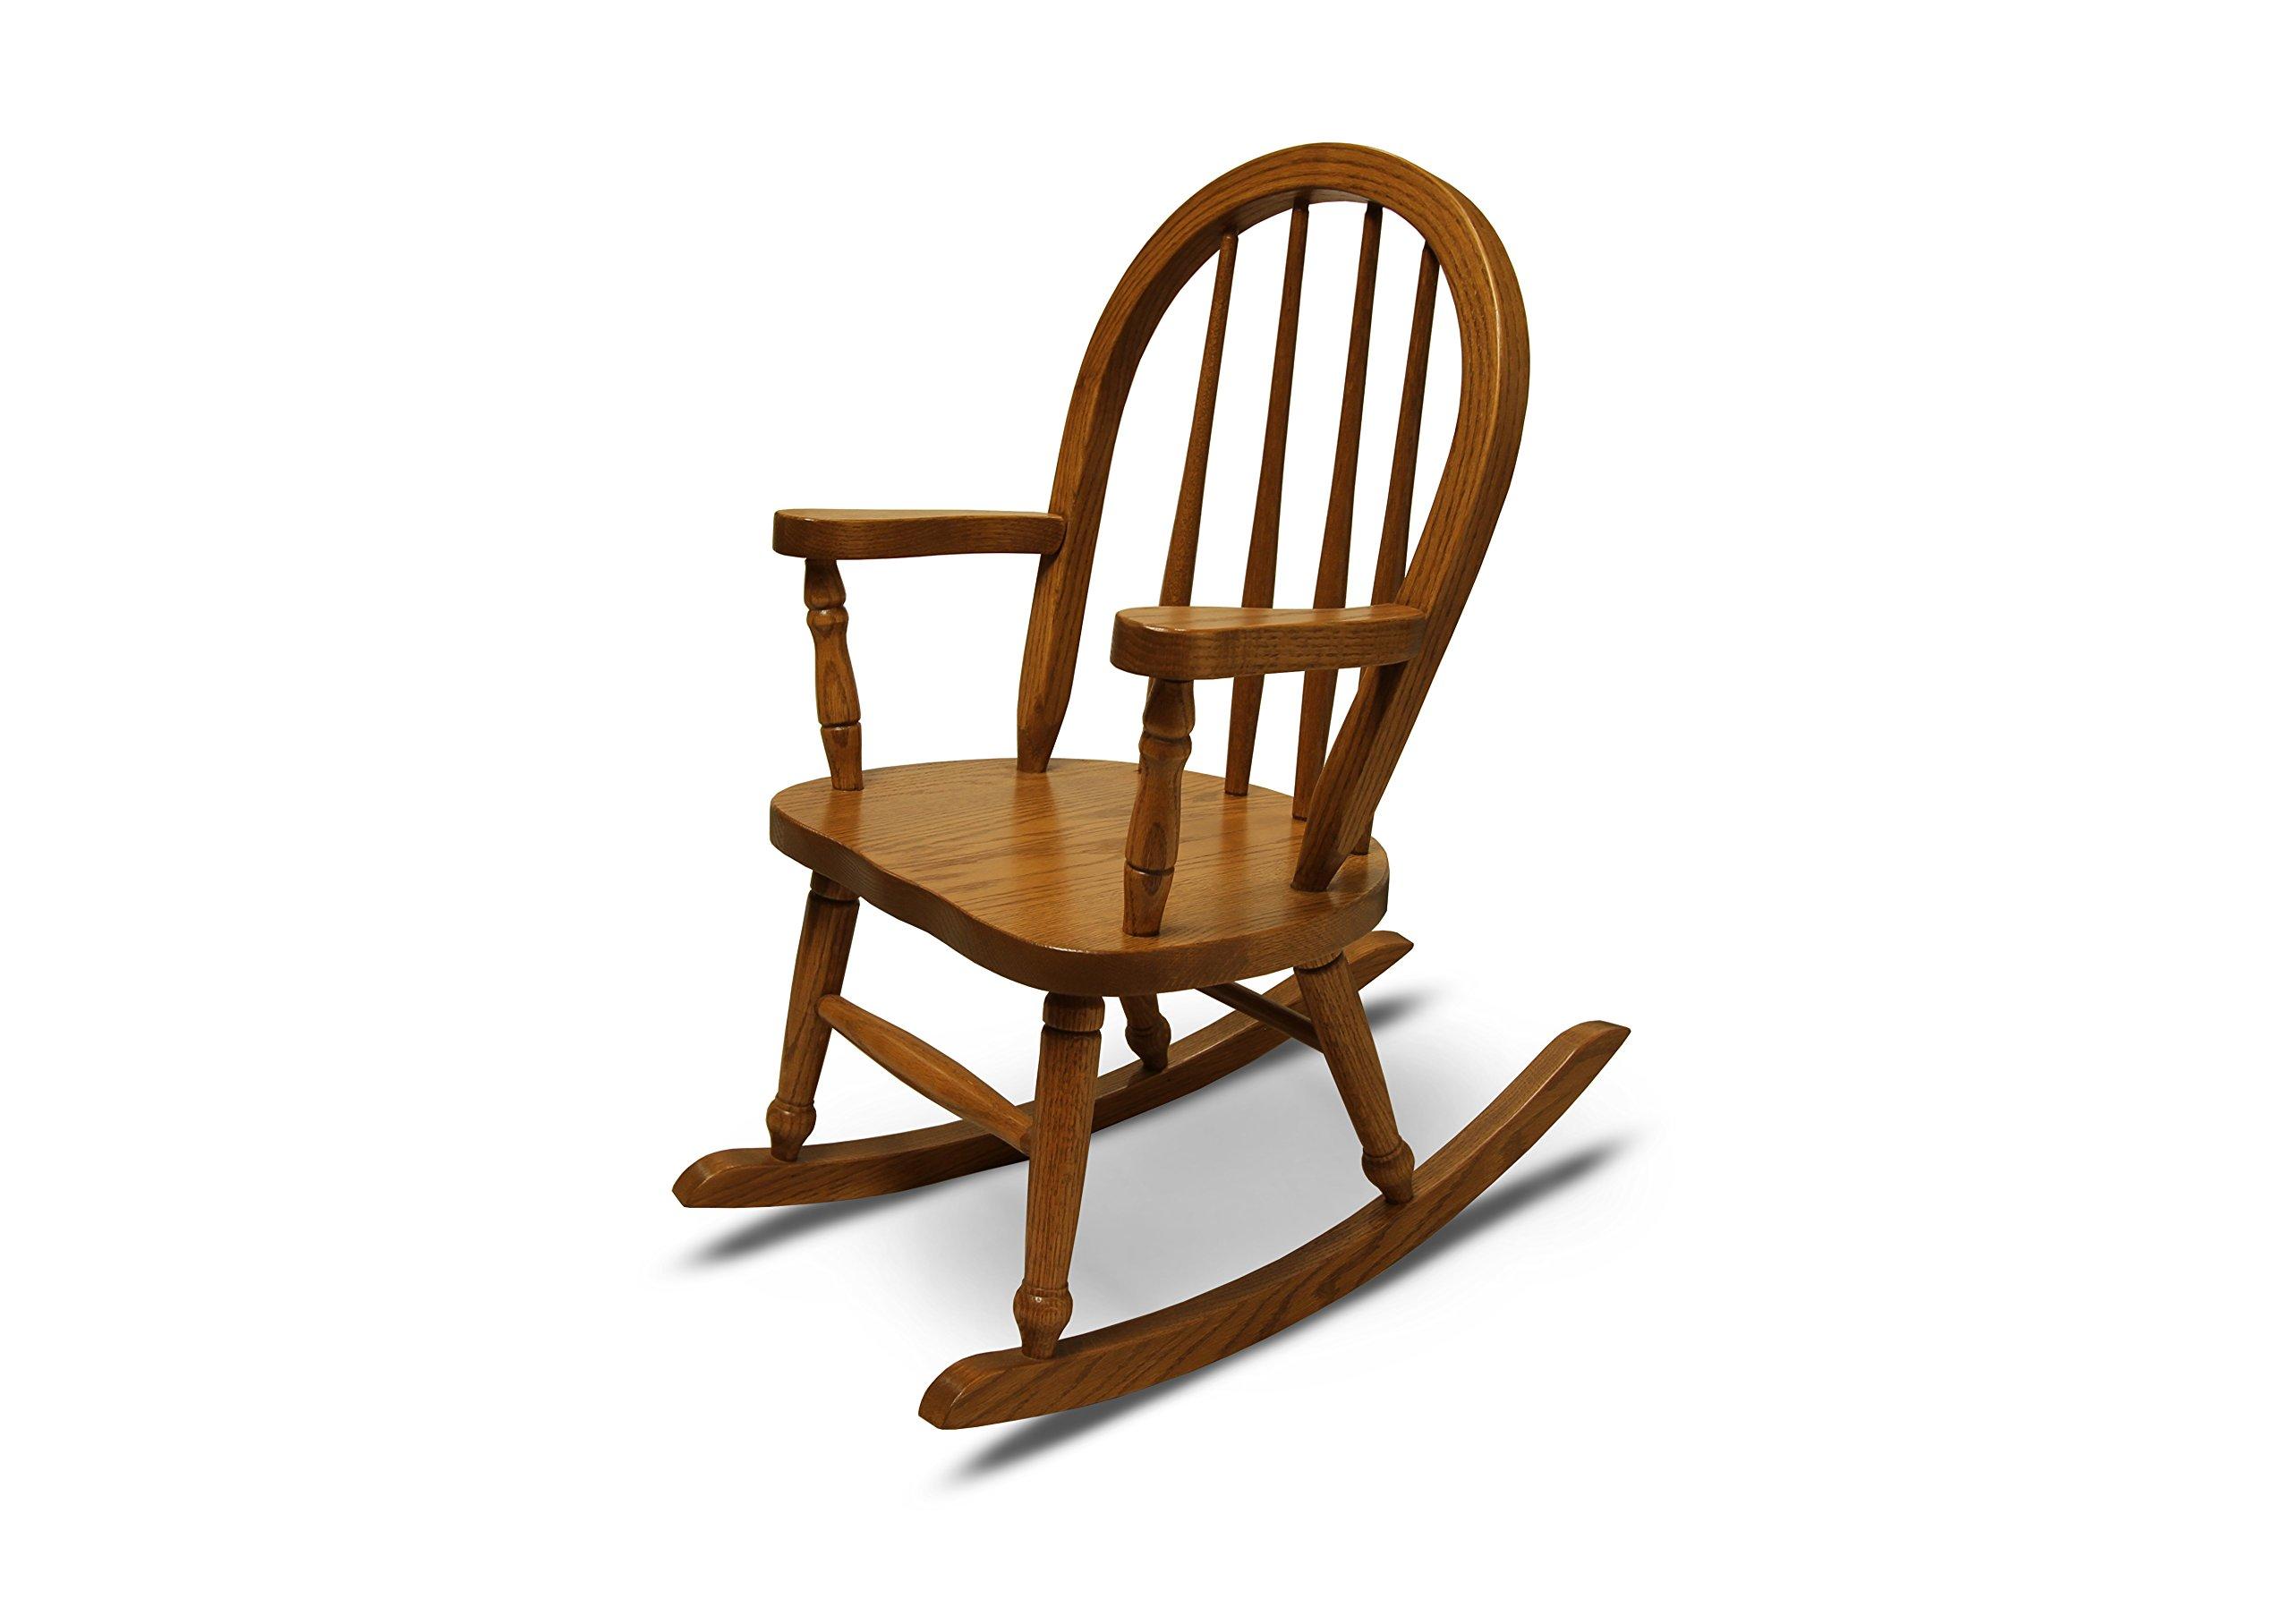 Weaver Craft Child's Rocking Chair Amish Made (Medium Oak) - Fully Assembled